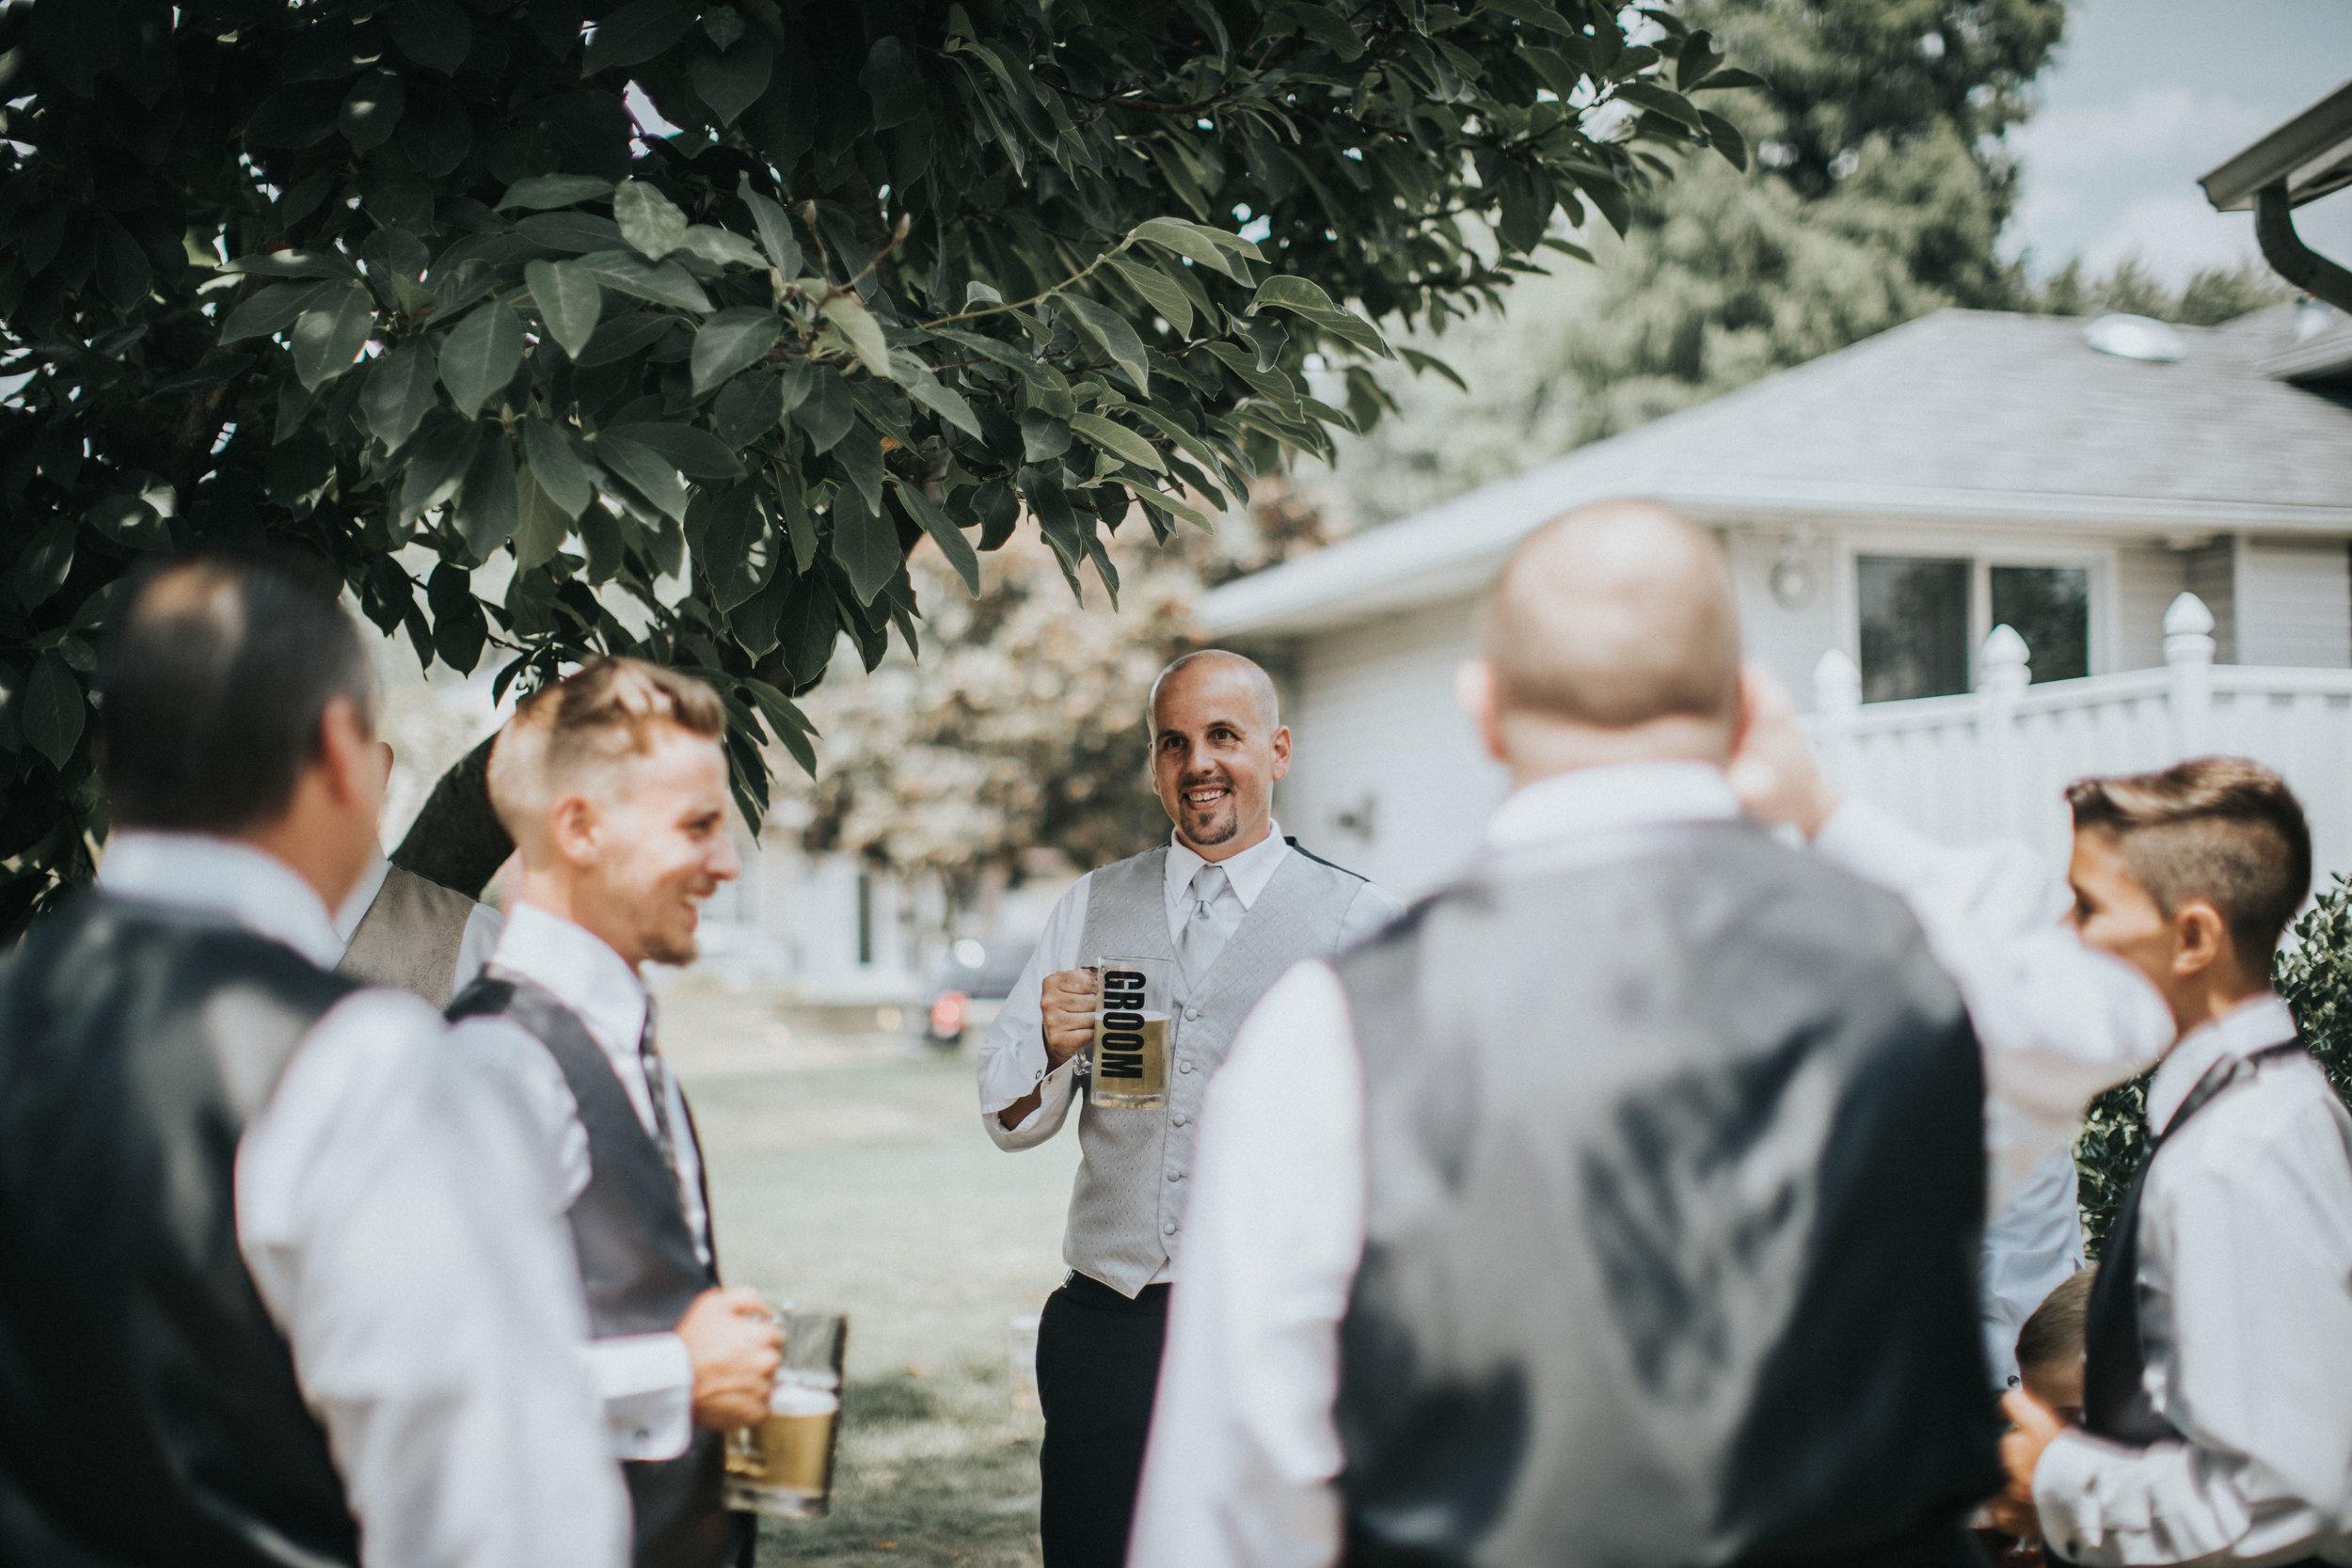 NewJersey_Wedding_Photography_Brigalias_Getting_Ready_Tara&Pete-44.jpg